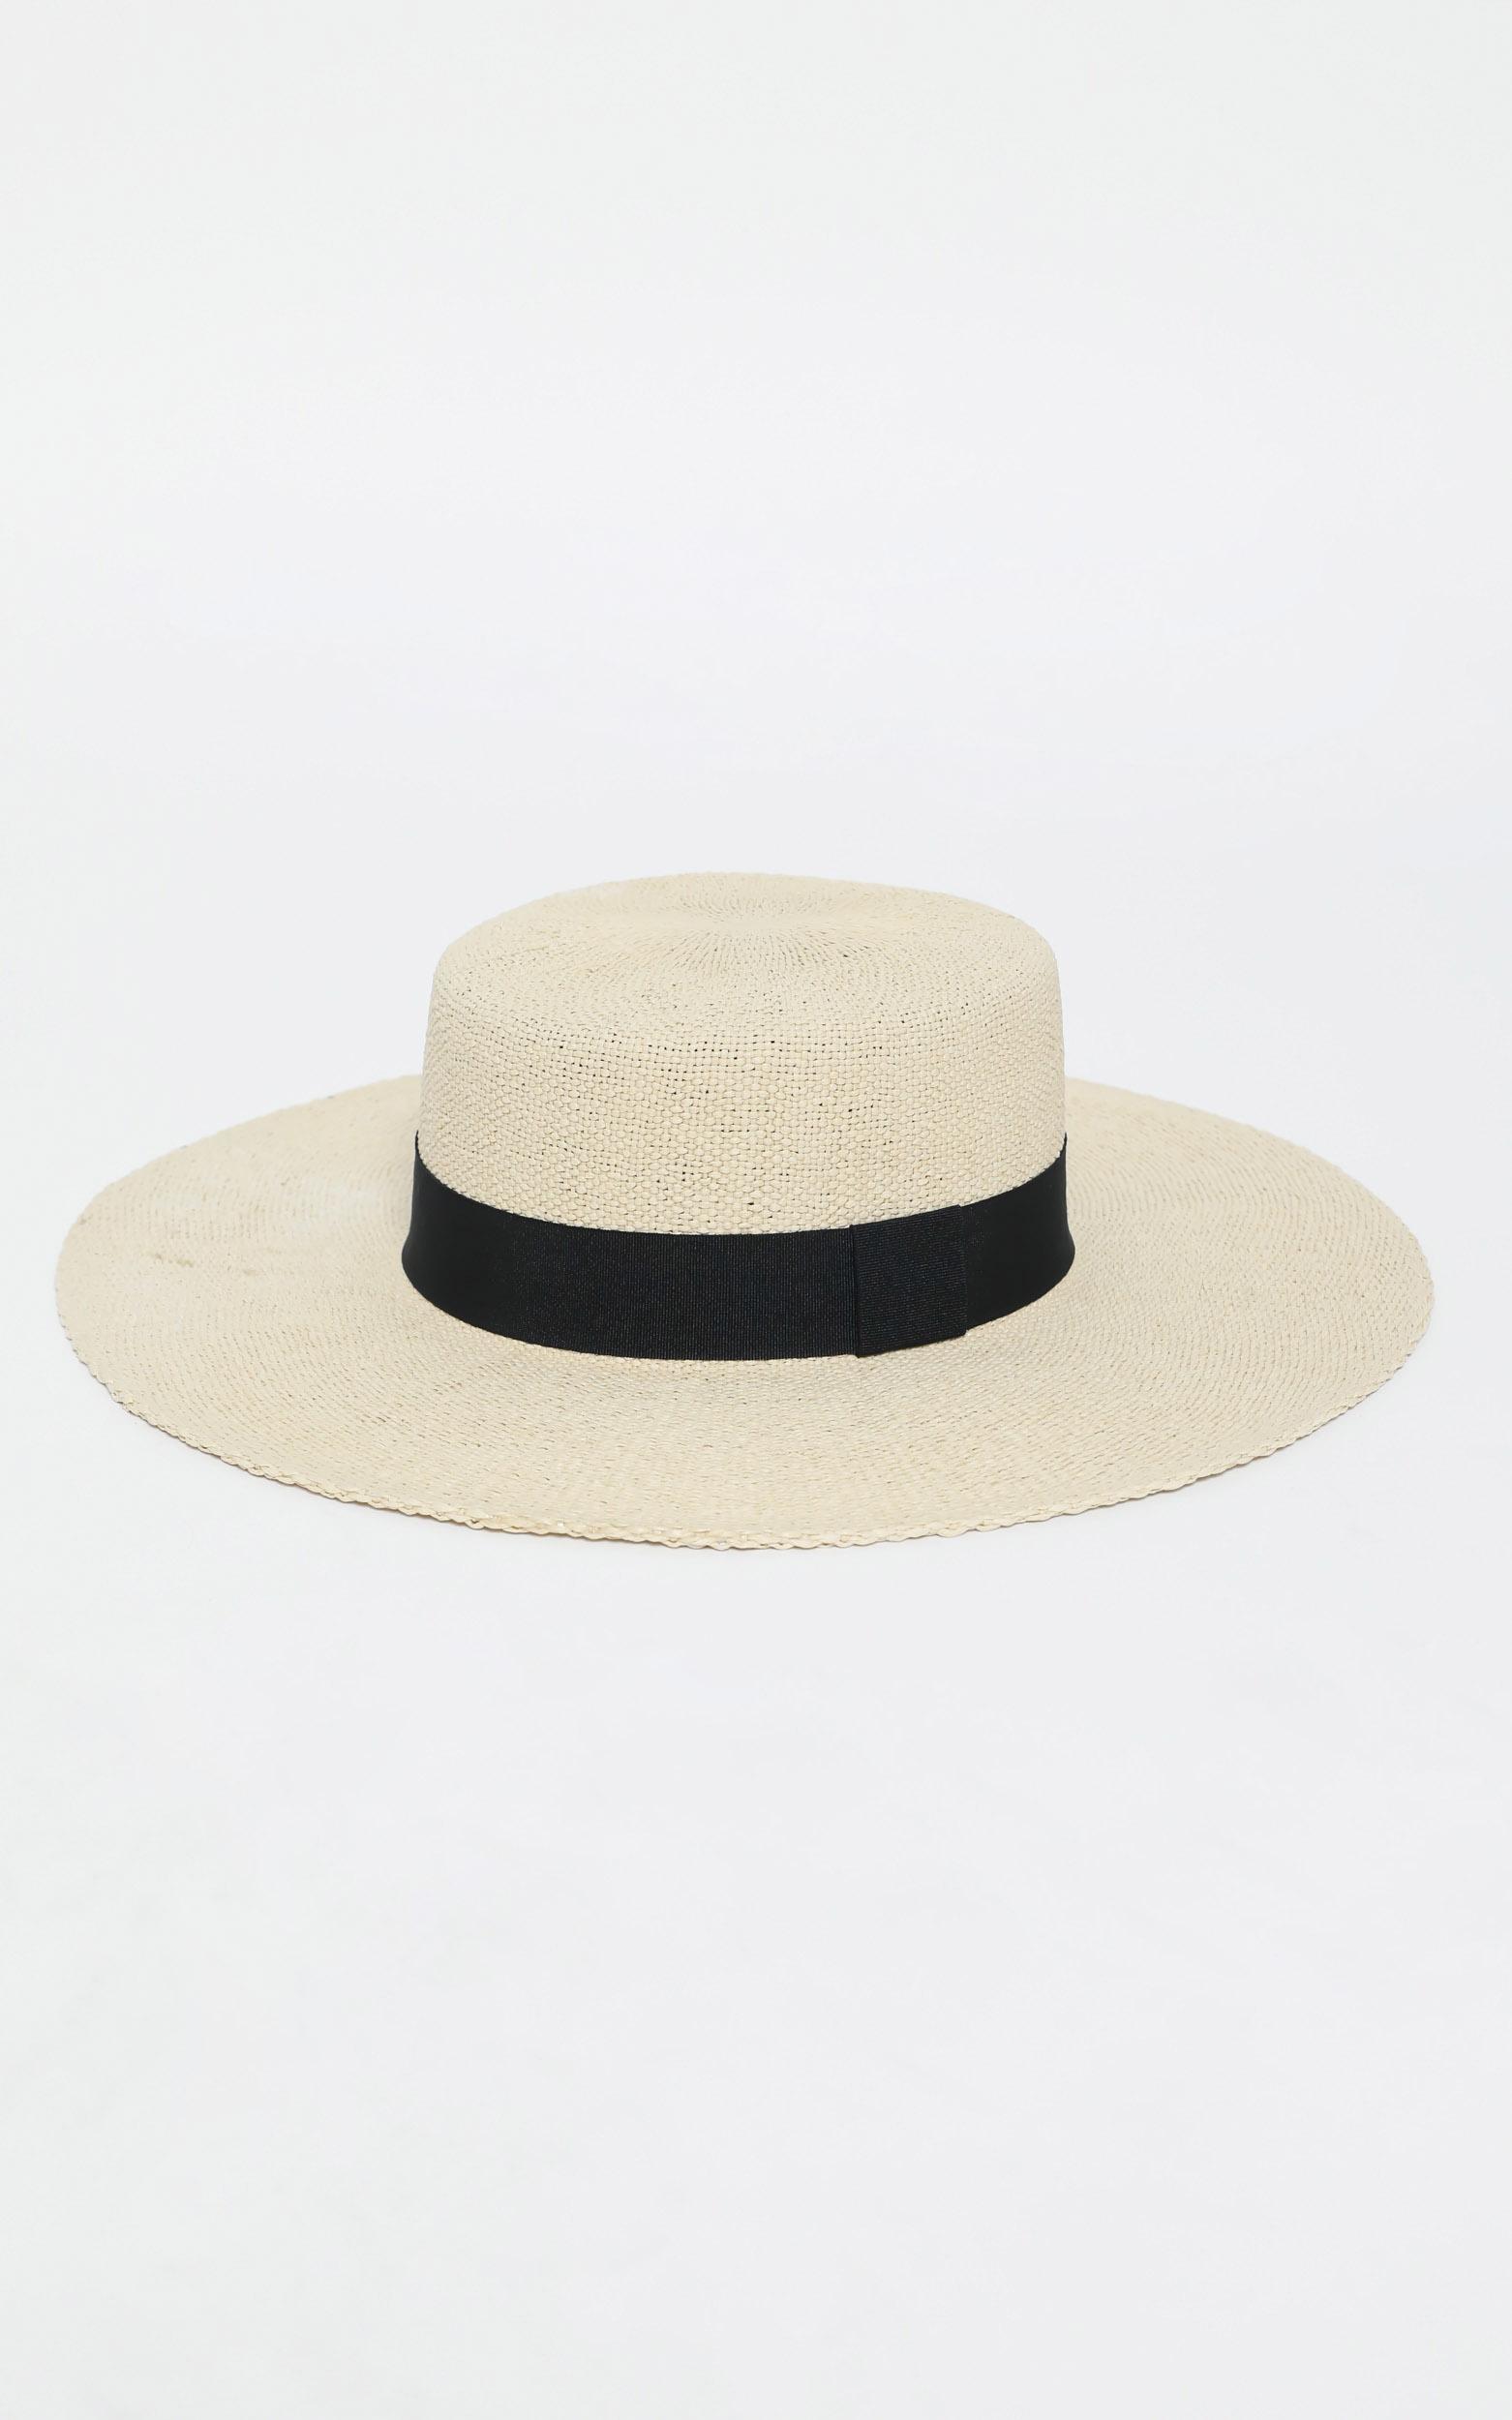 Alphonse Straw Hat in Beige, , hi-res image number null